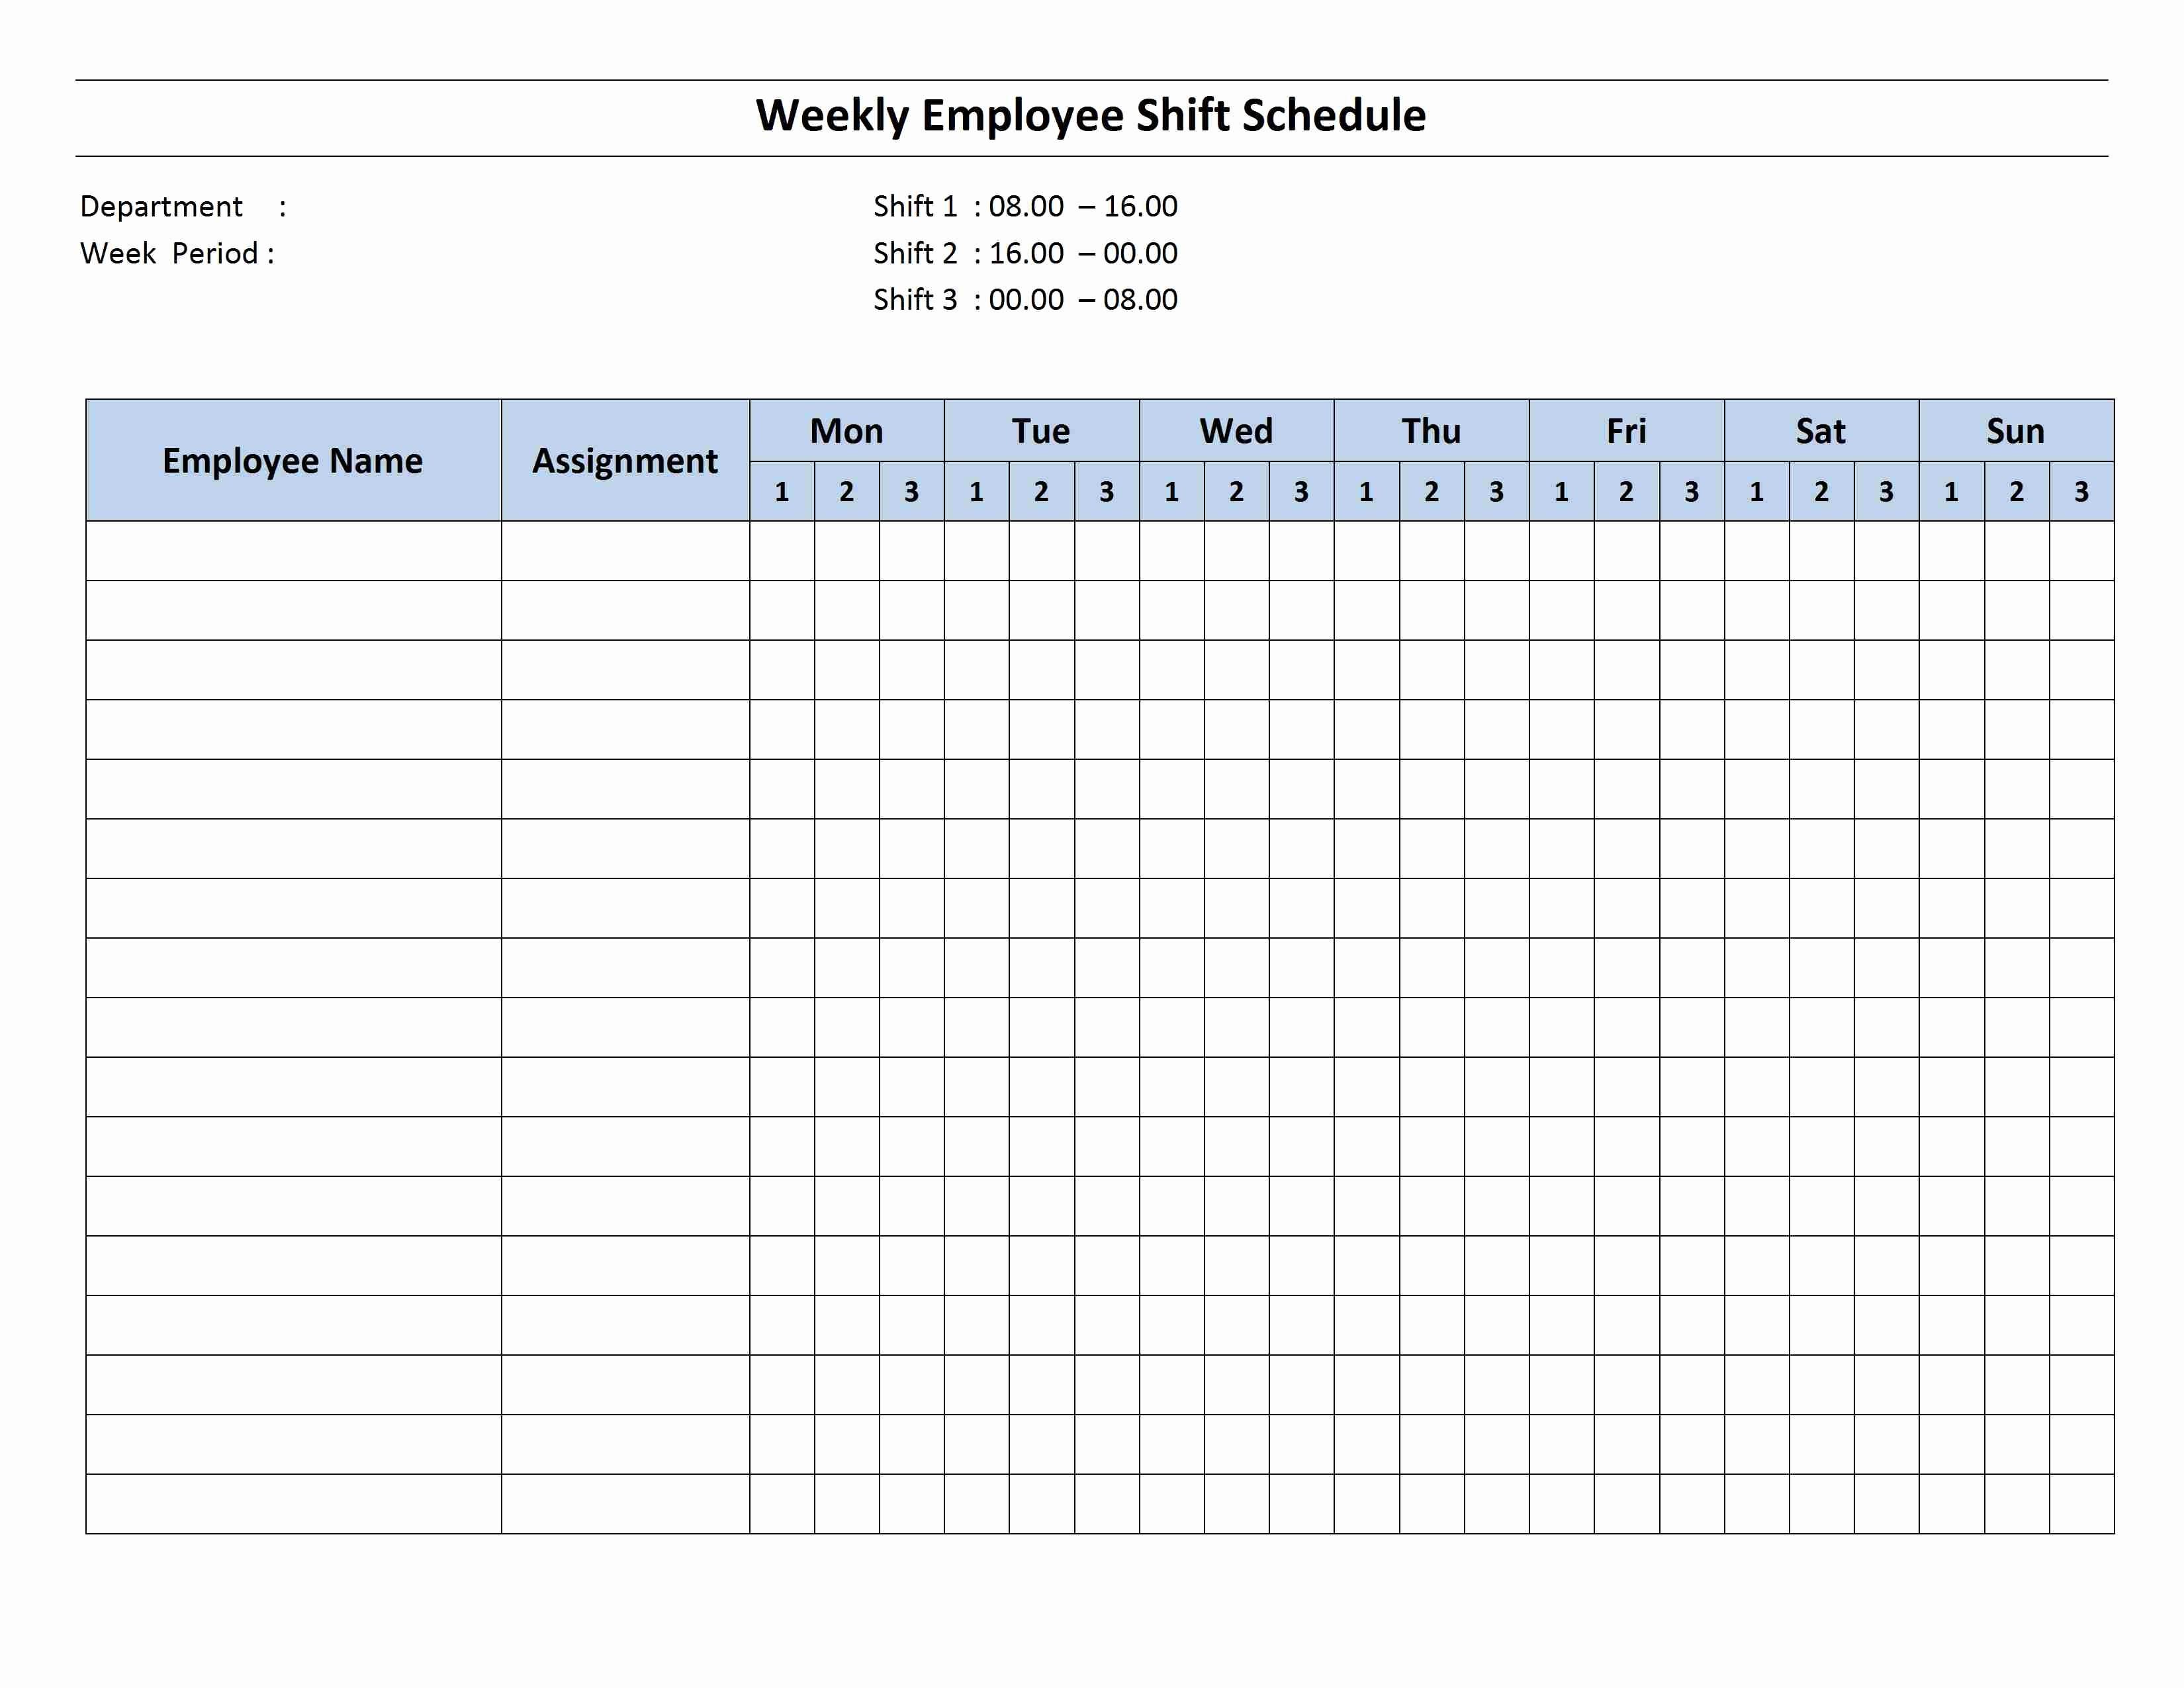 Weekly Work Schedule Template Word Best Of Weekly 8 Hour Shift Schedule